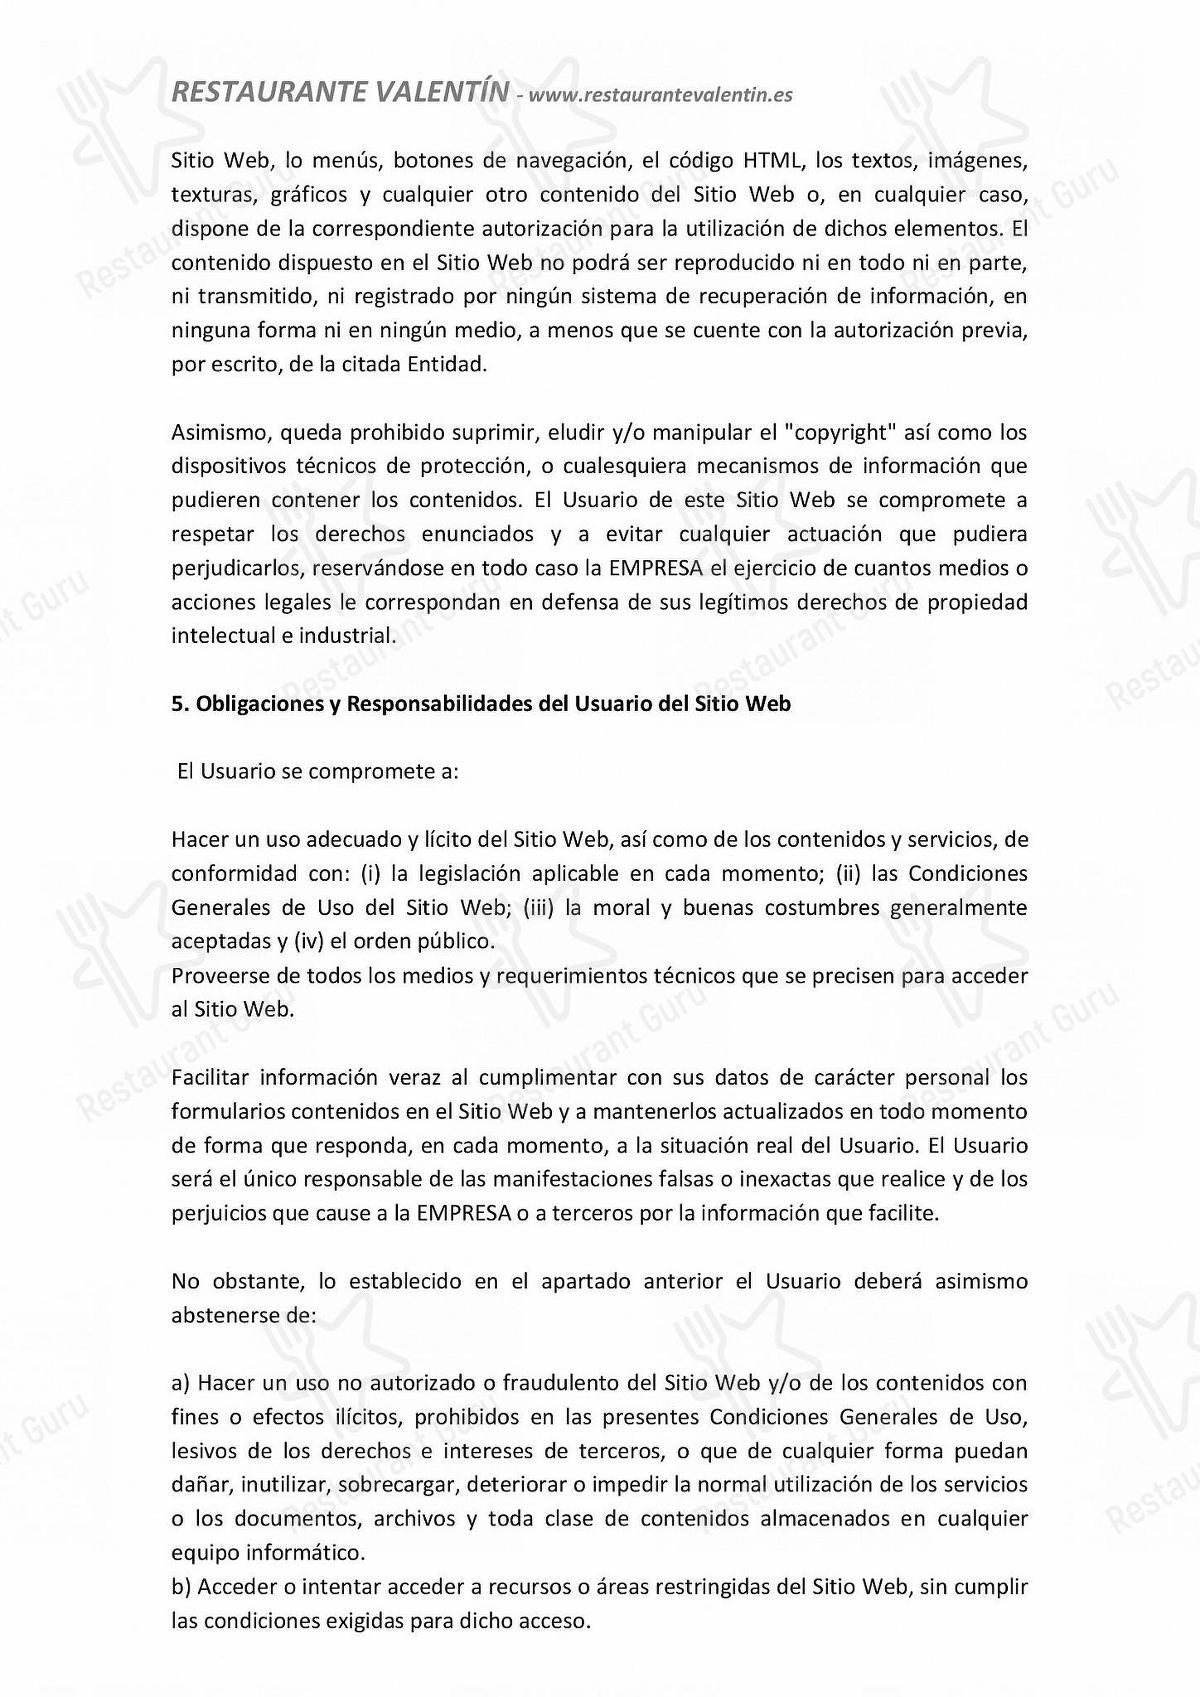 Carta de Restaurante Valentín restaurante